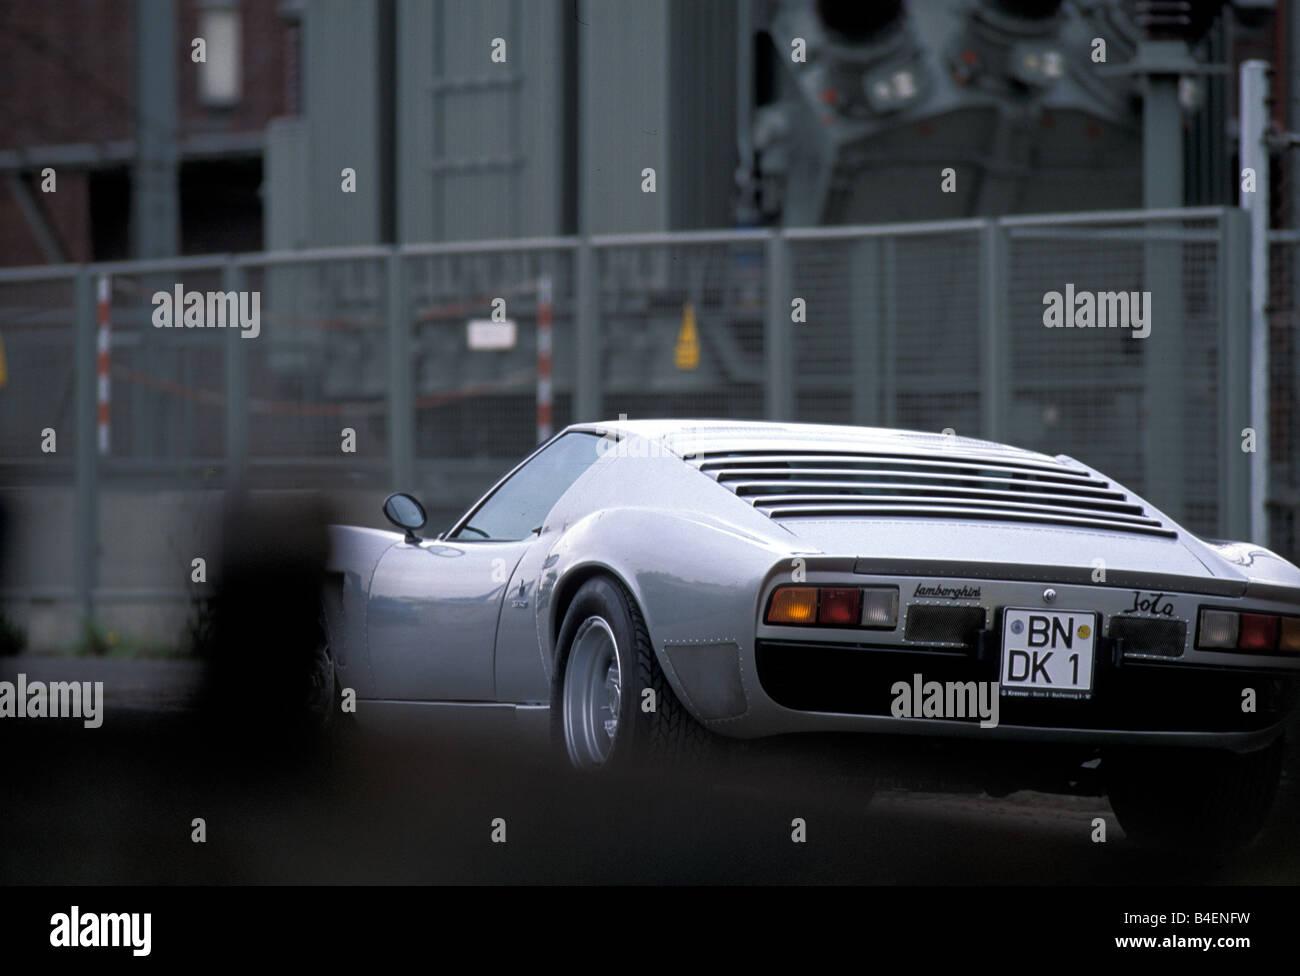 http://c8.alamy.com/comp/B4ENFW/car-lamborghini-miura-sv-jota-model-year-1970s-seventies-silver-sports-B4ENFW.jpg